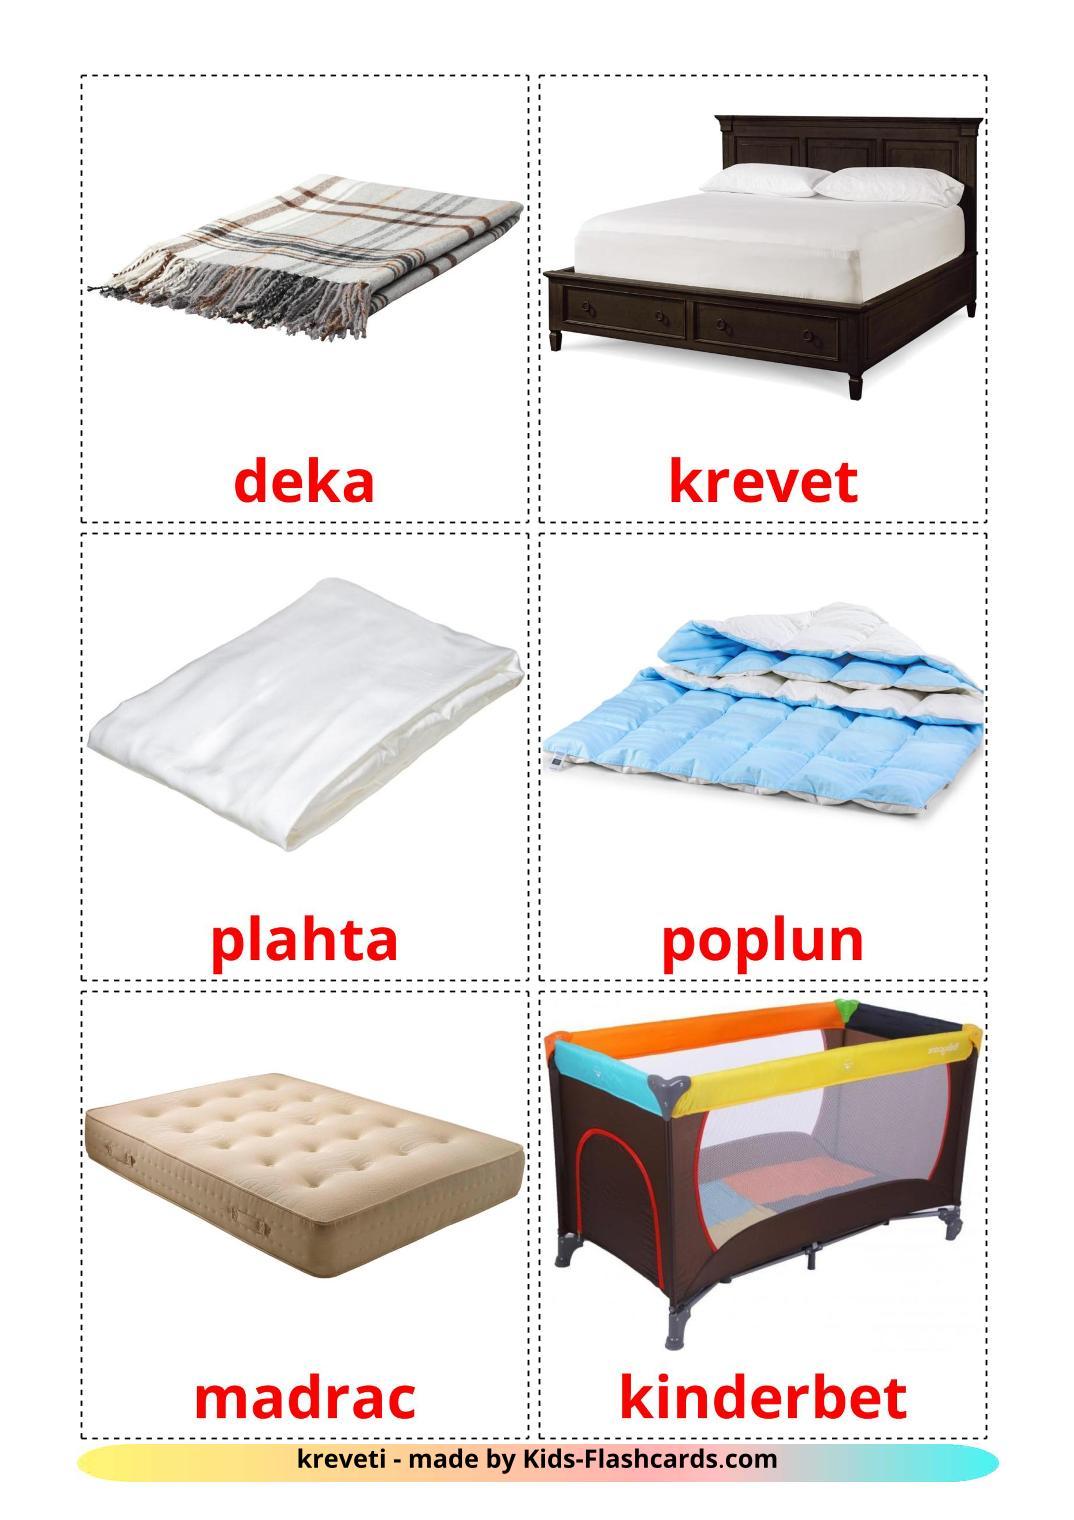 Bed - 15 Free Printable croatian Flashcards